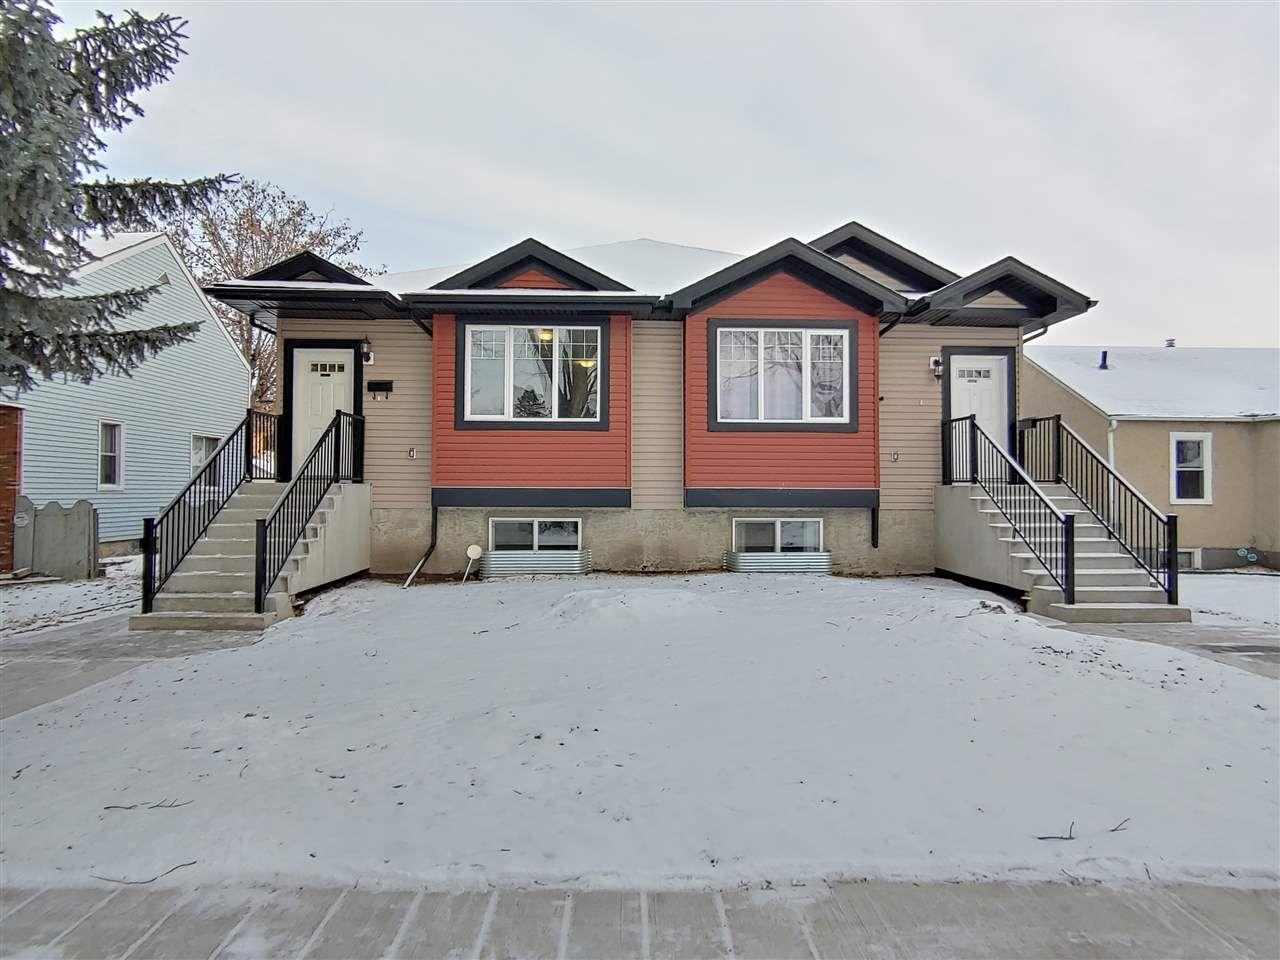 Main Photo: 11639-11637 125 in Edmonton: Zone 07 House Duplex for sale : MLS®# E4226440